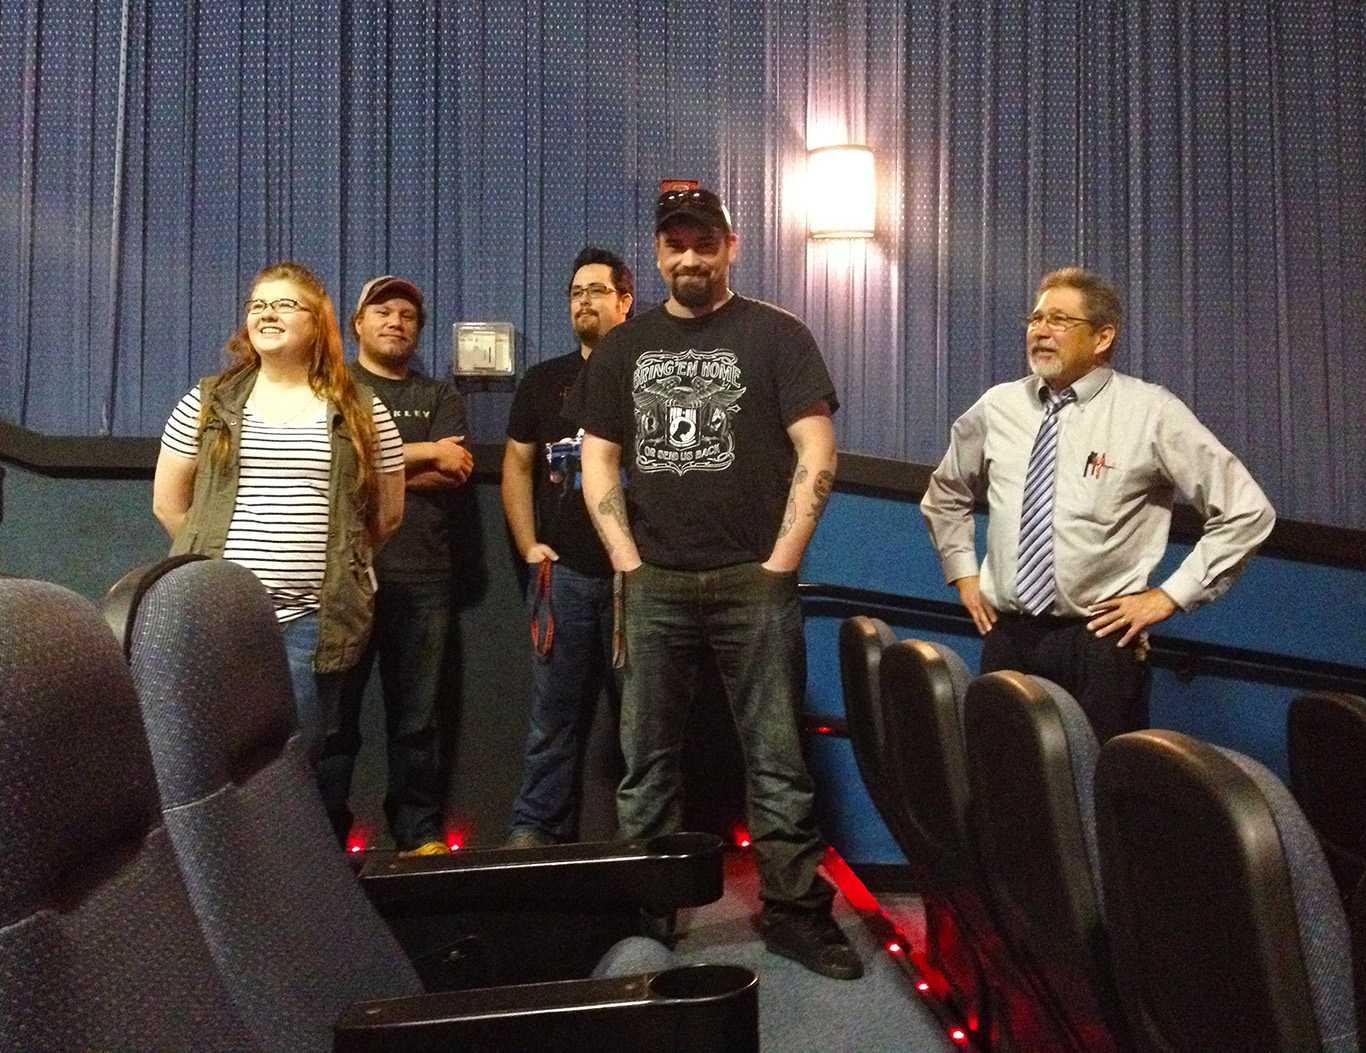 Digital Cinema and Media Students (from left) Madison Hill, Drew Dolezal, Tynan Vetter, Josh Ottis, Instructor Timothy Miller